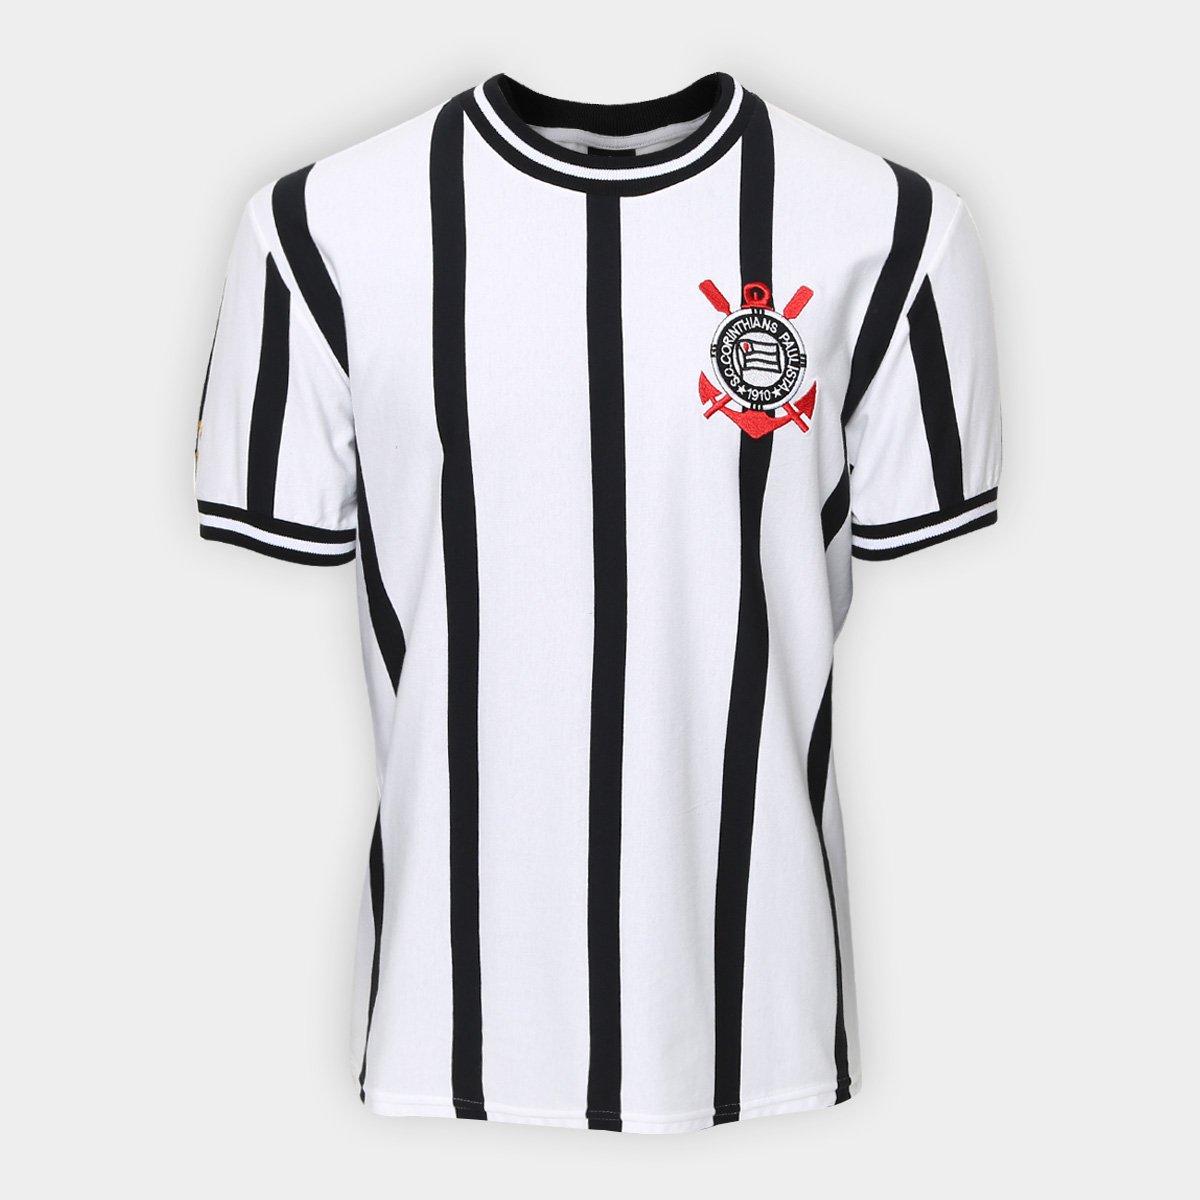 fe8dd140d3b88 Camiseta Corinthians Réplica 1971 Masculina - Compre Agora